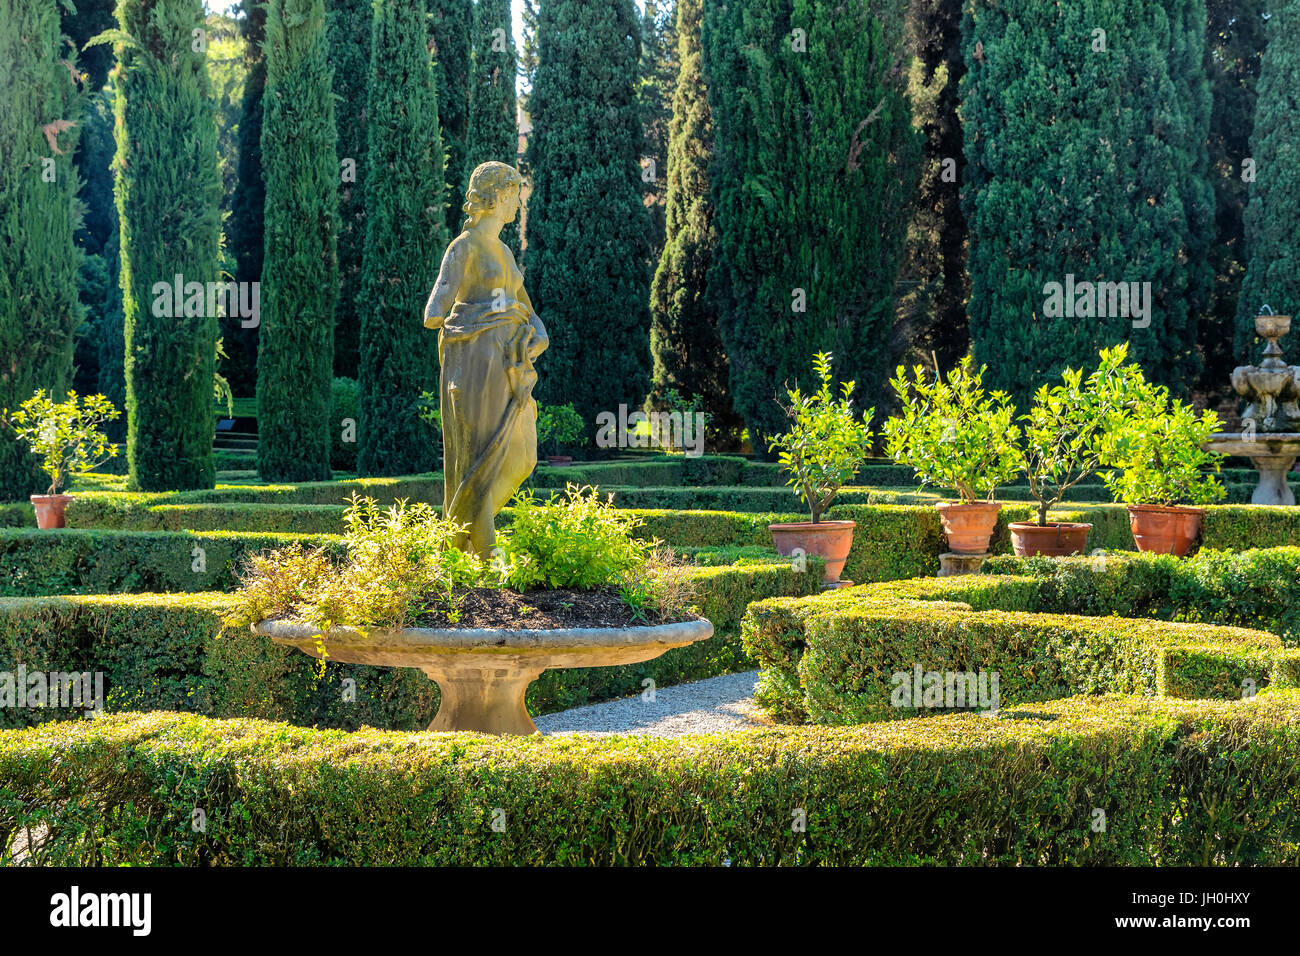 Statue in giardini giusti verona stock photo alamy